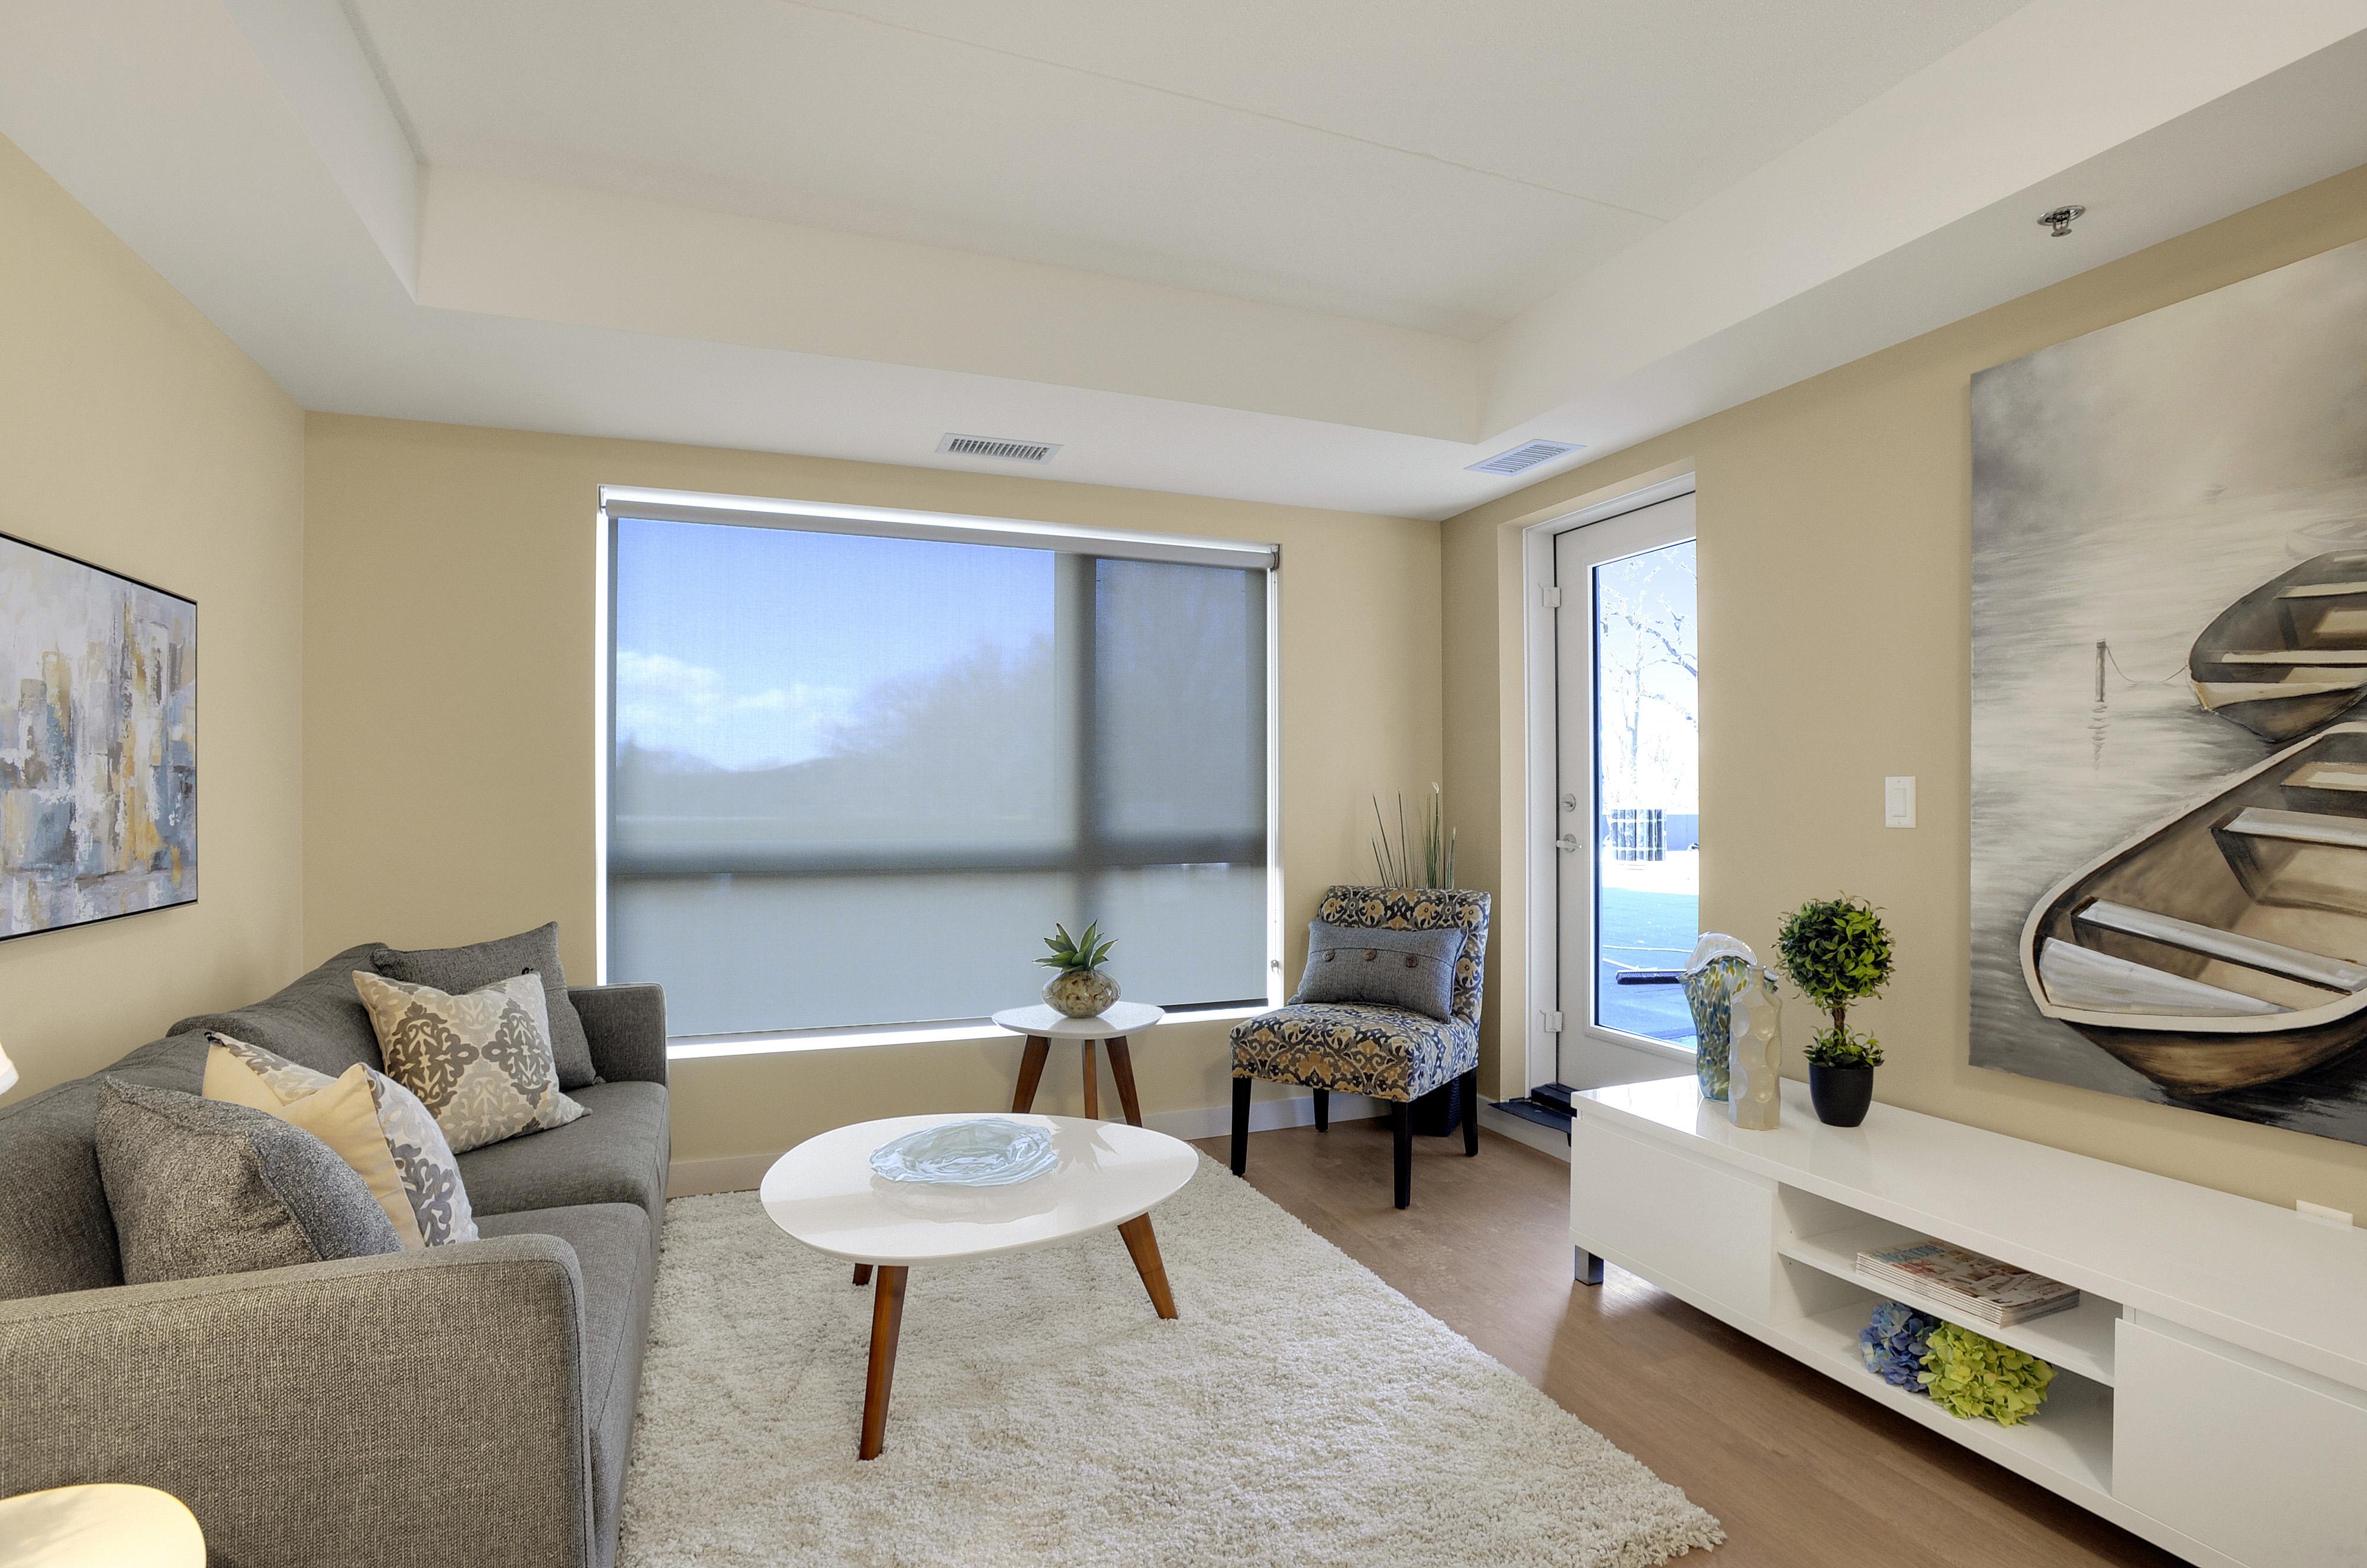 50 Whellams Lane, Winnipeg, MB - $1,314